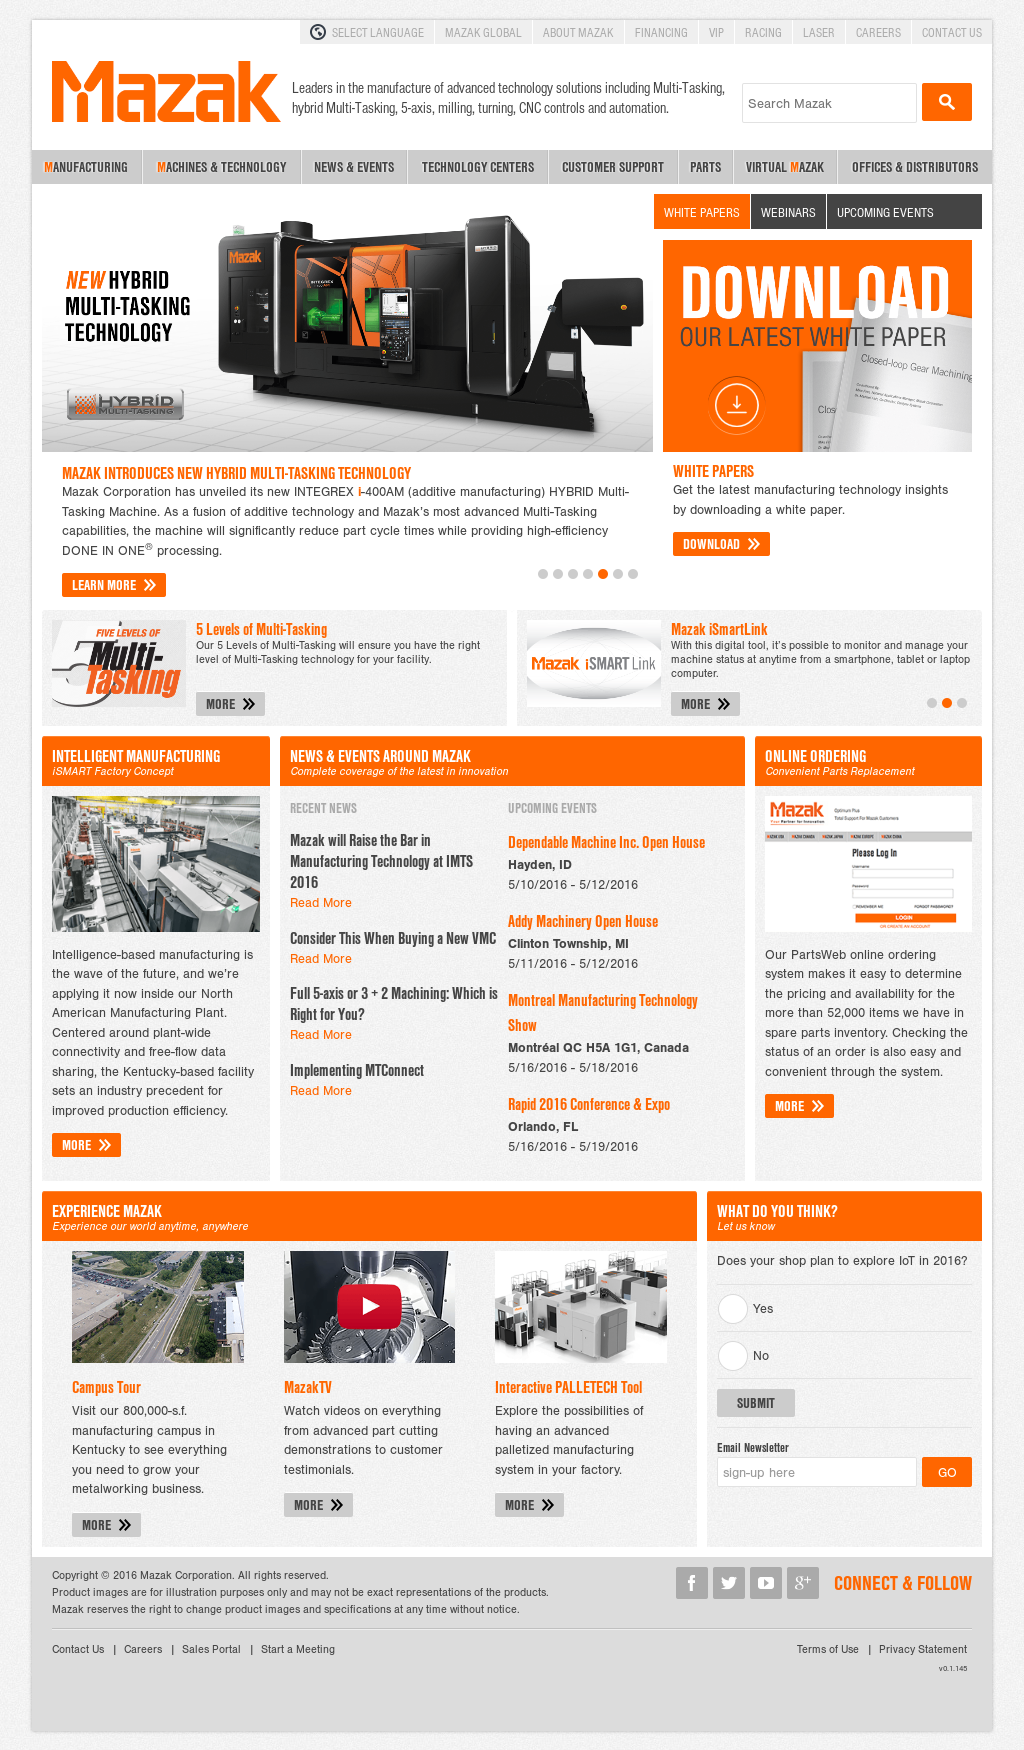 Mazak Competitors, Revenue and Employees - Owler Company Profile